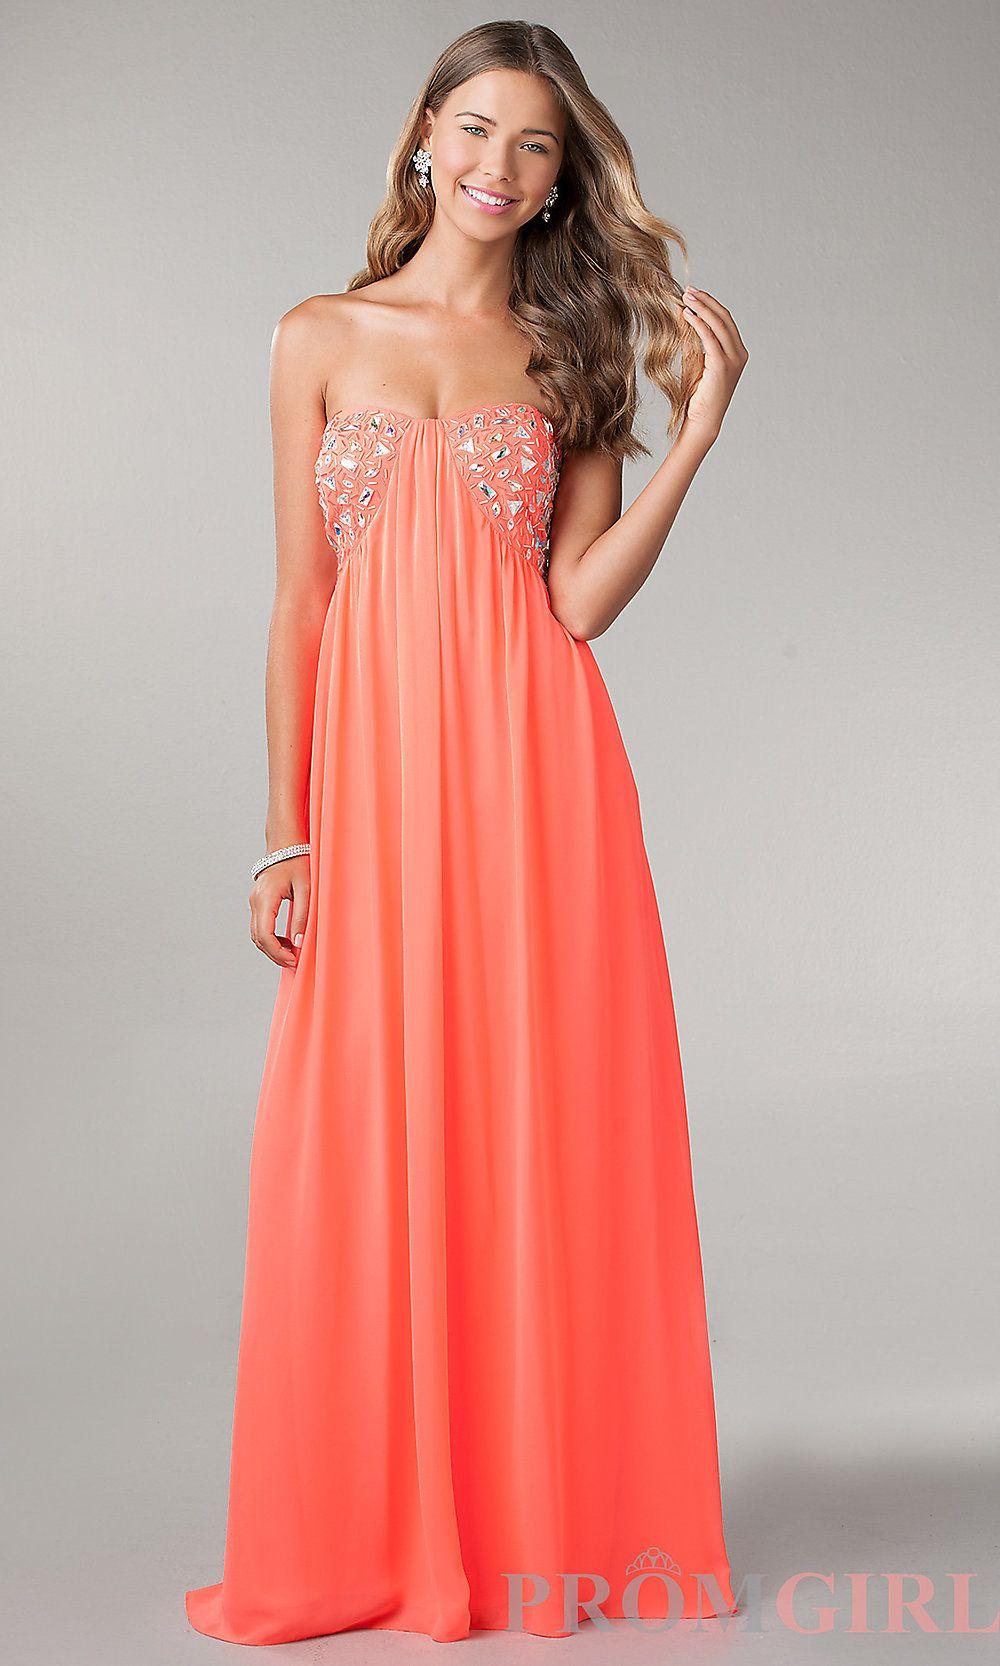 strapless-prom-dresses-tumblr-neon-coral-prom-dresses-strapless ...